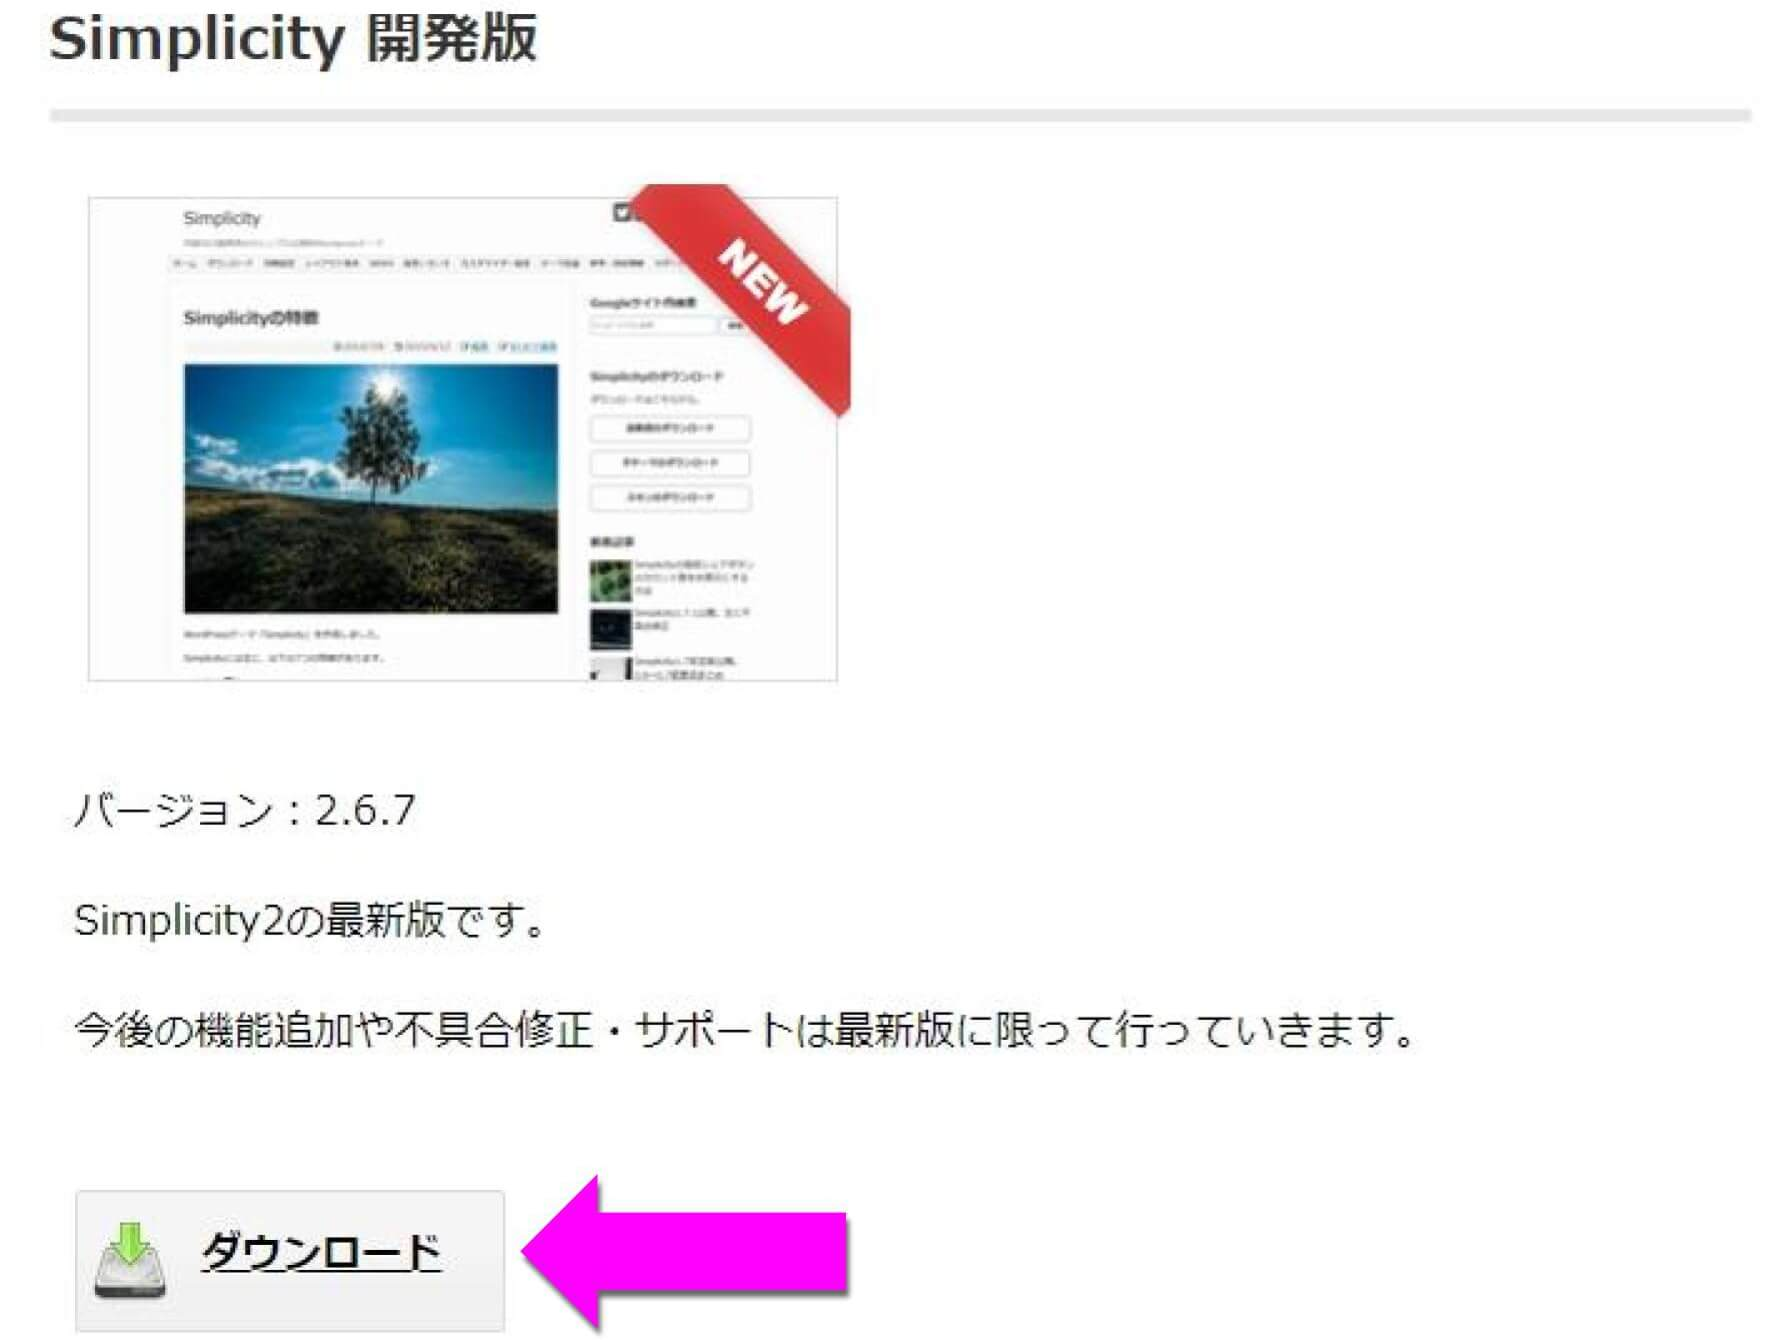 Simplicity2 ダウンロード